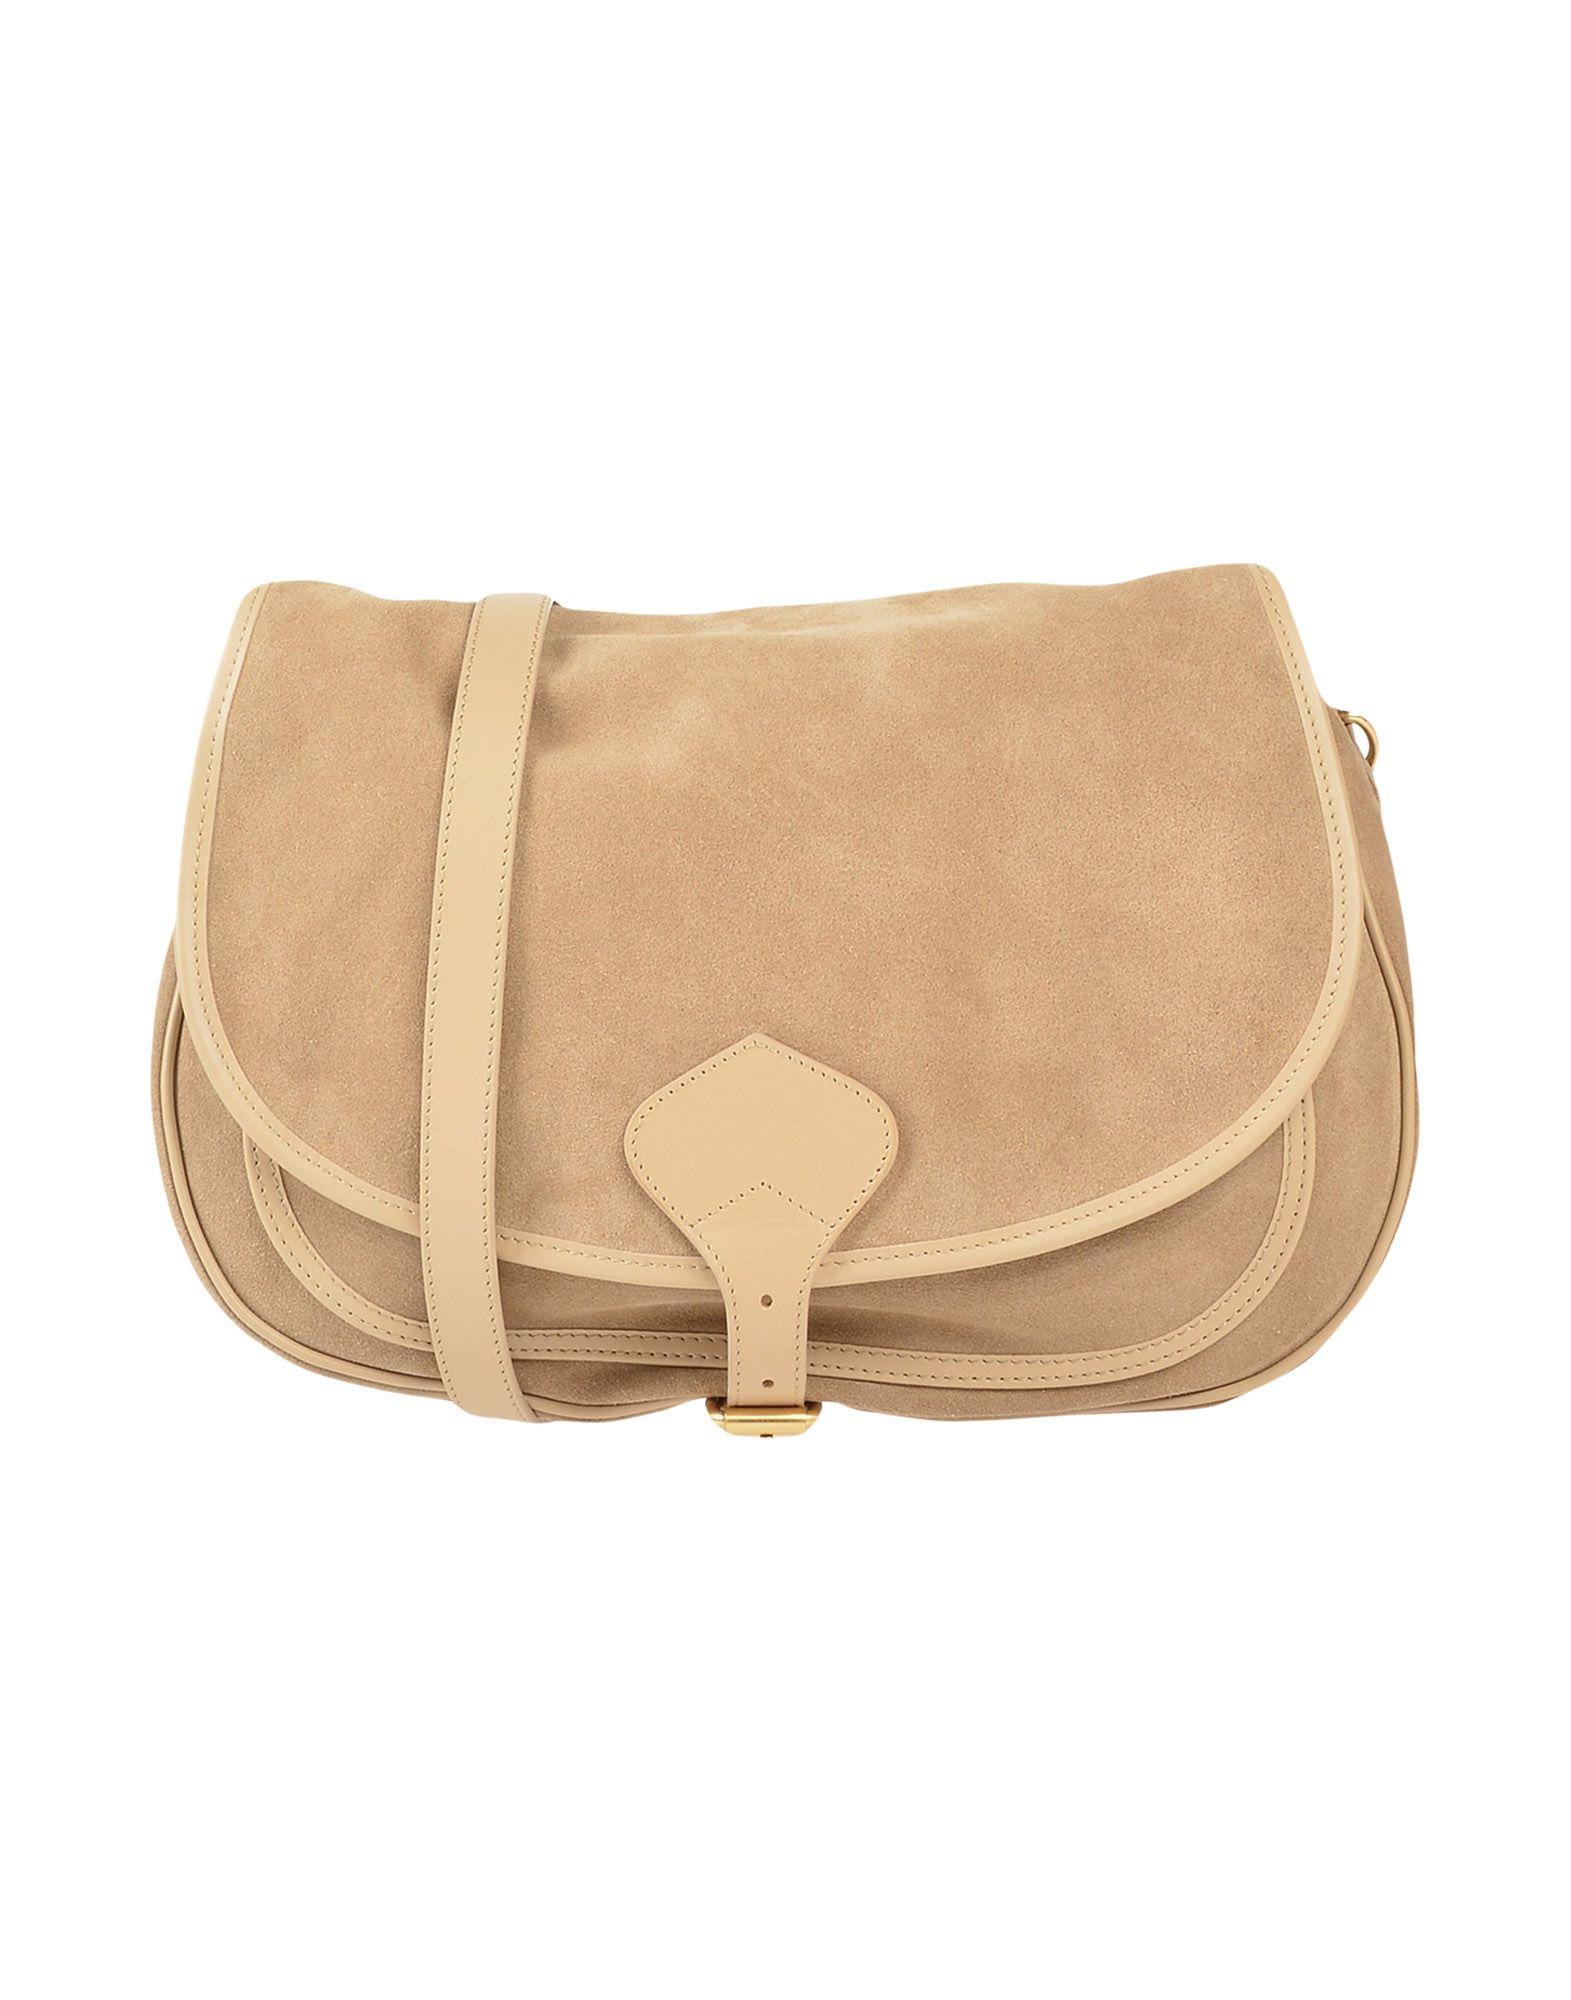 AVRIL GAU Handbags in Beige